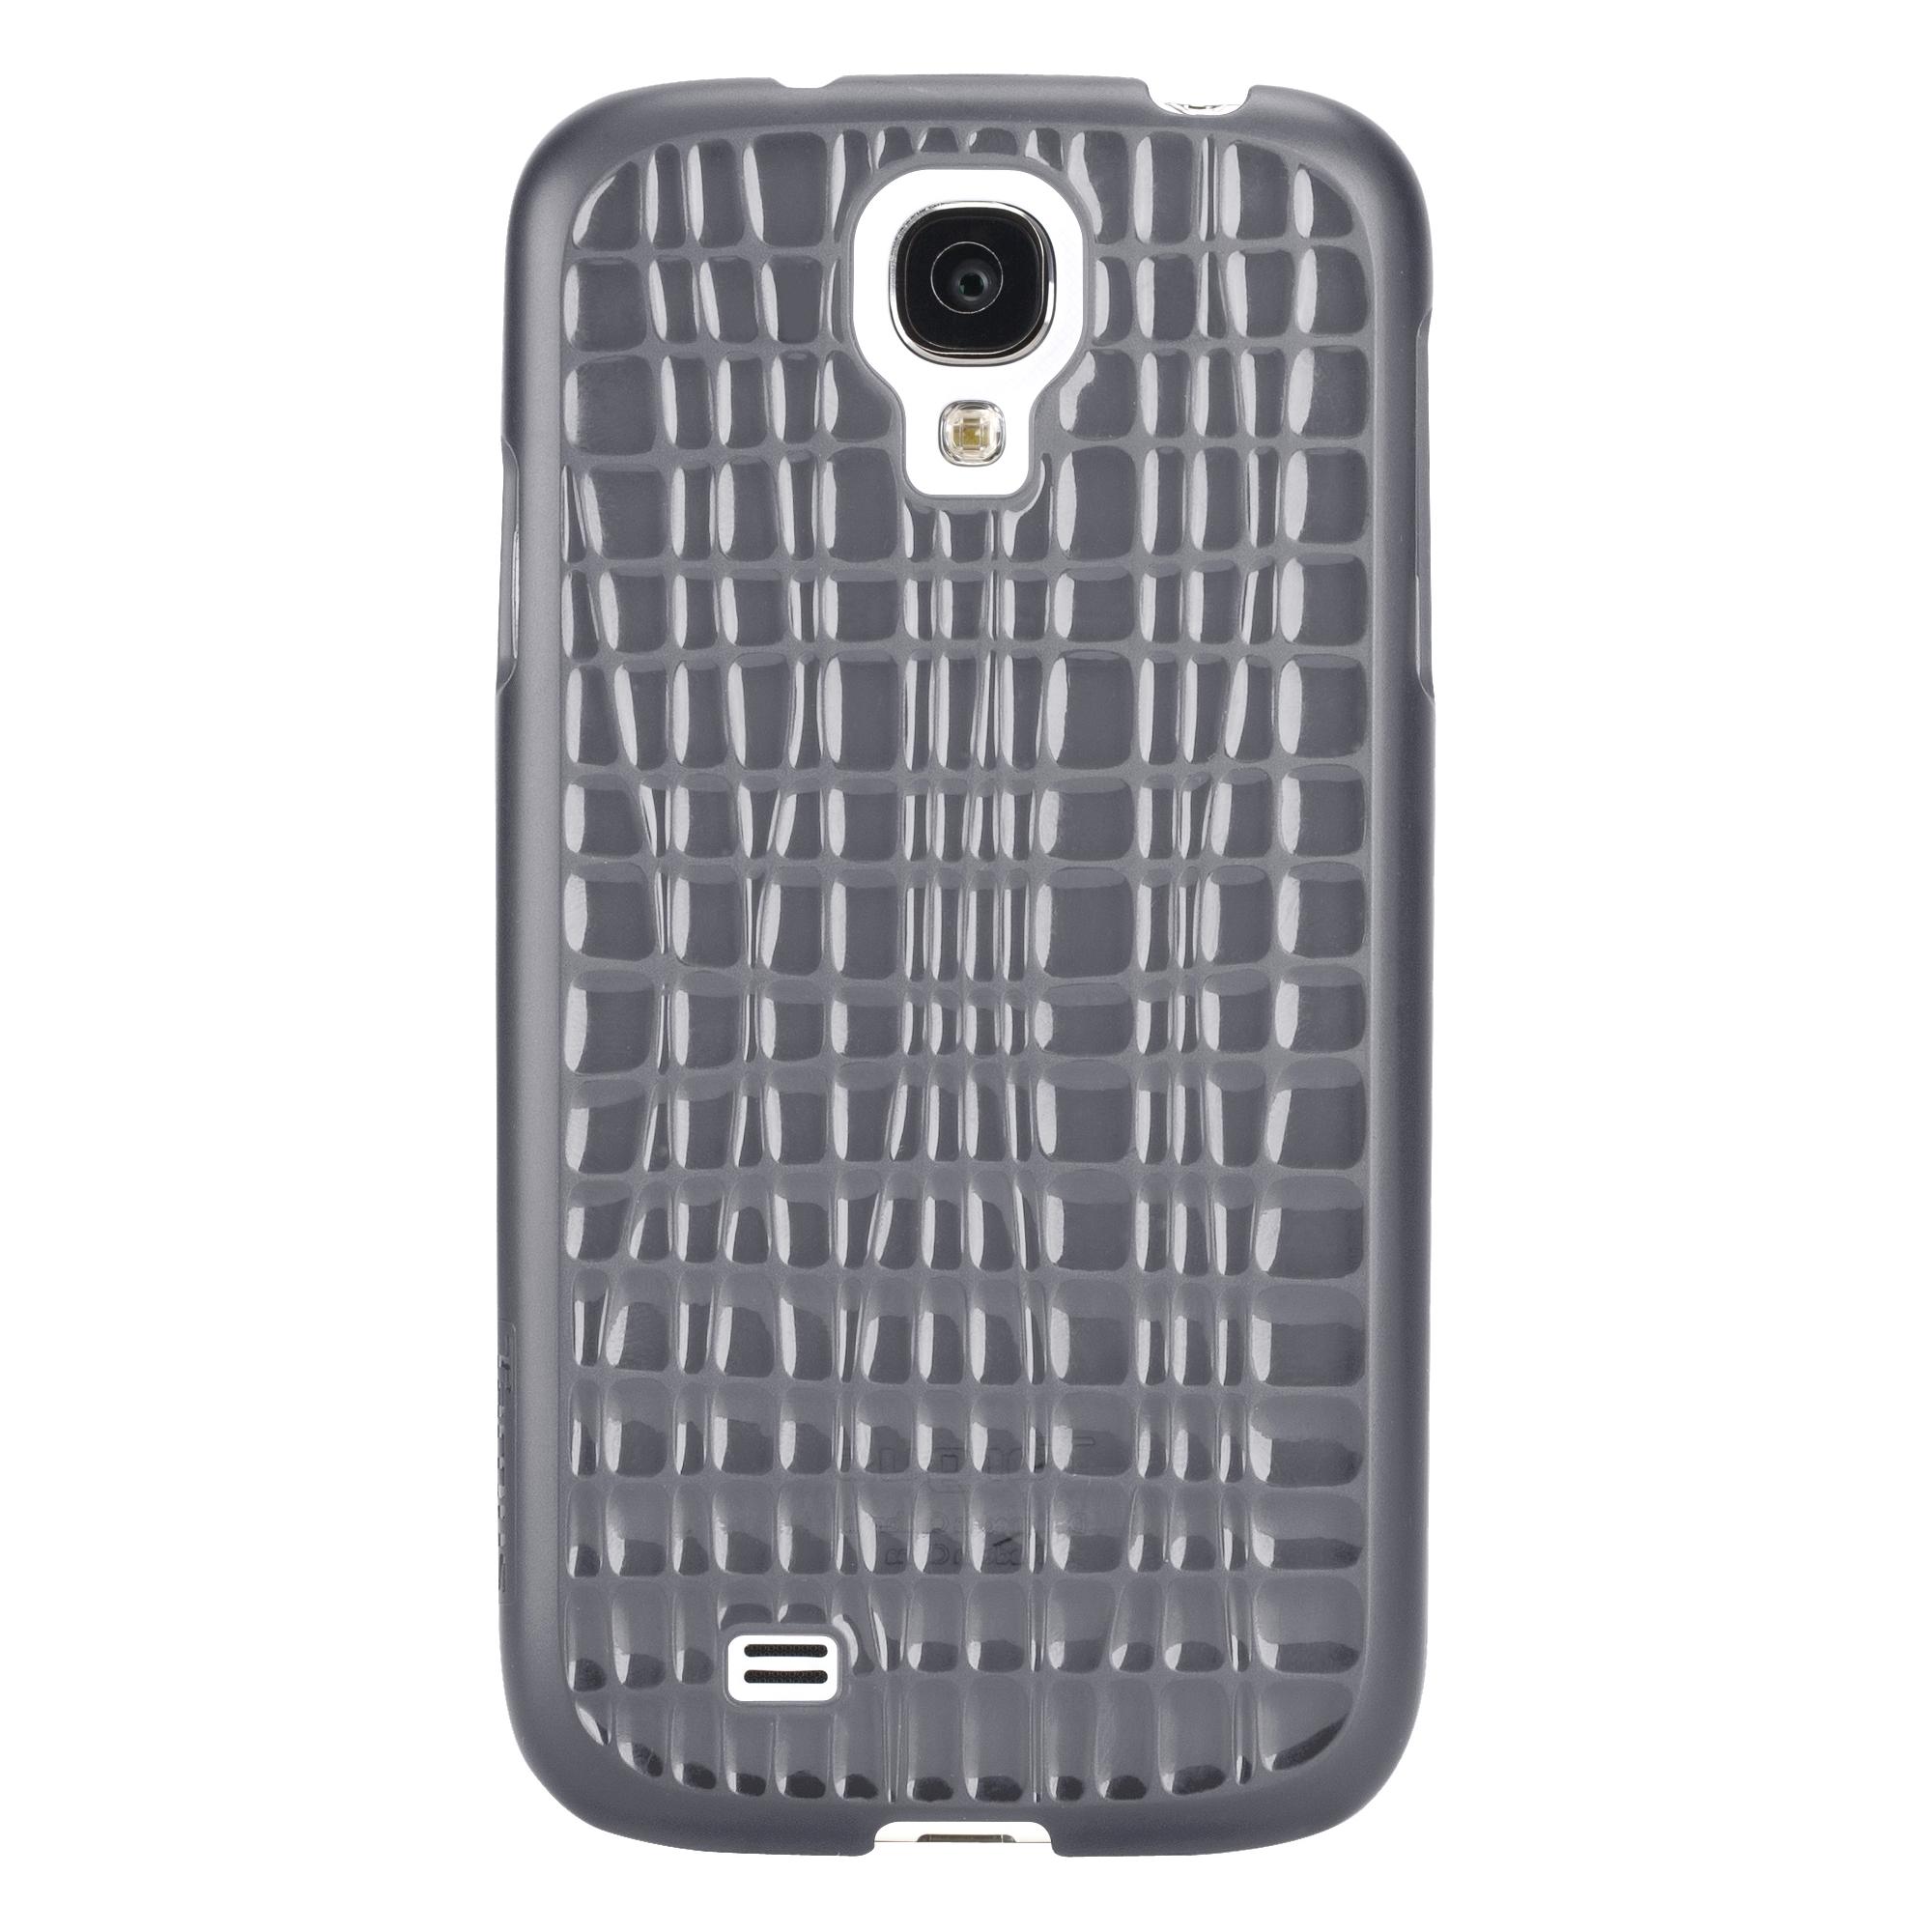 Slim Wave Case for Samsung Galaxy S4 (Noir) - Smartphone - BlackNoir - Textured - Matte Glossy - Polycarbonate